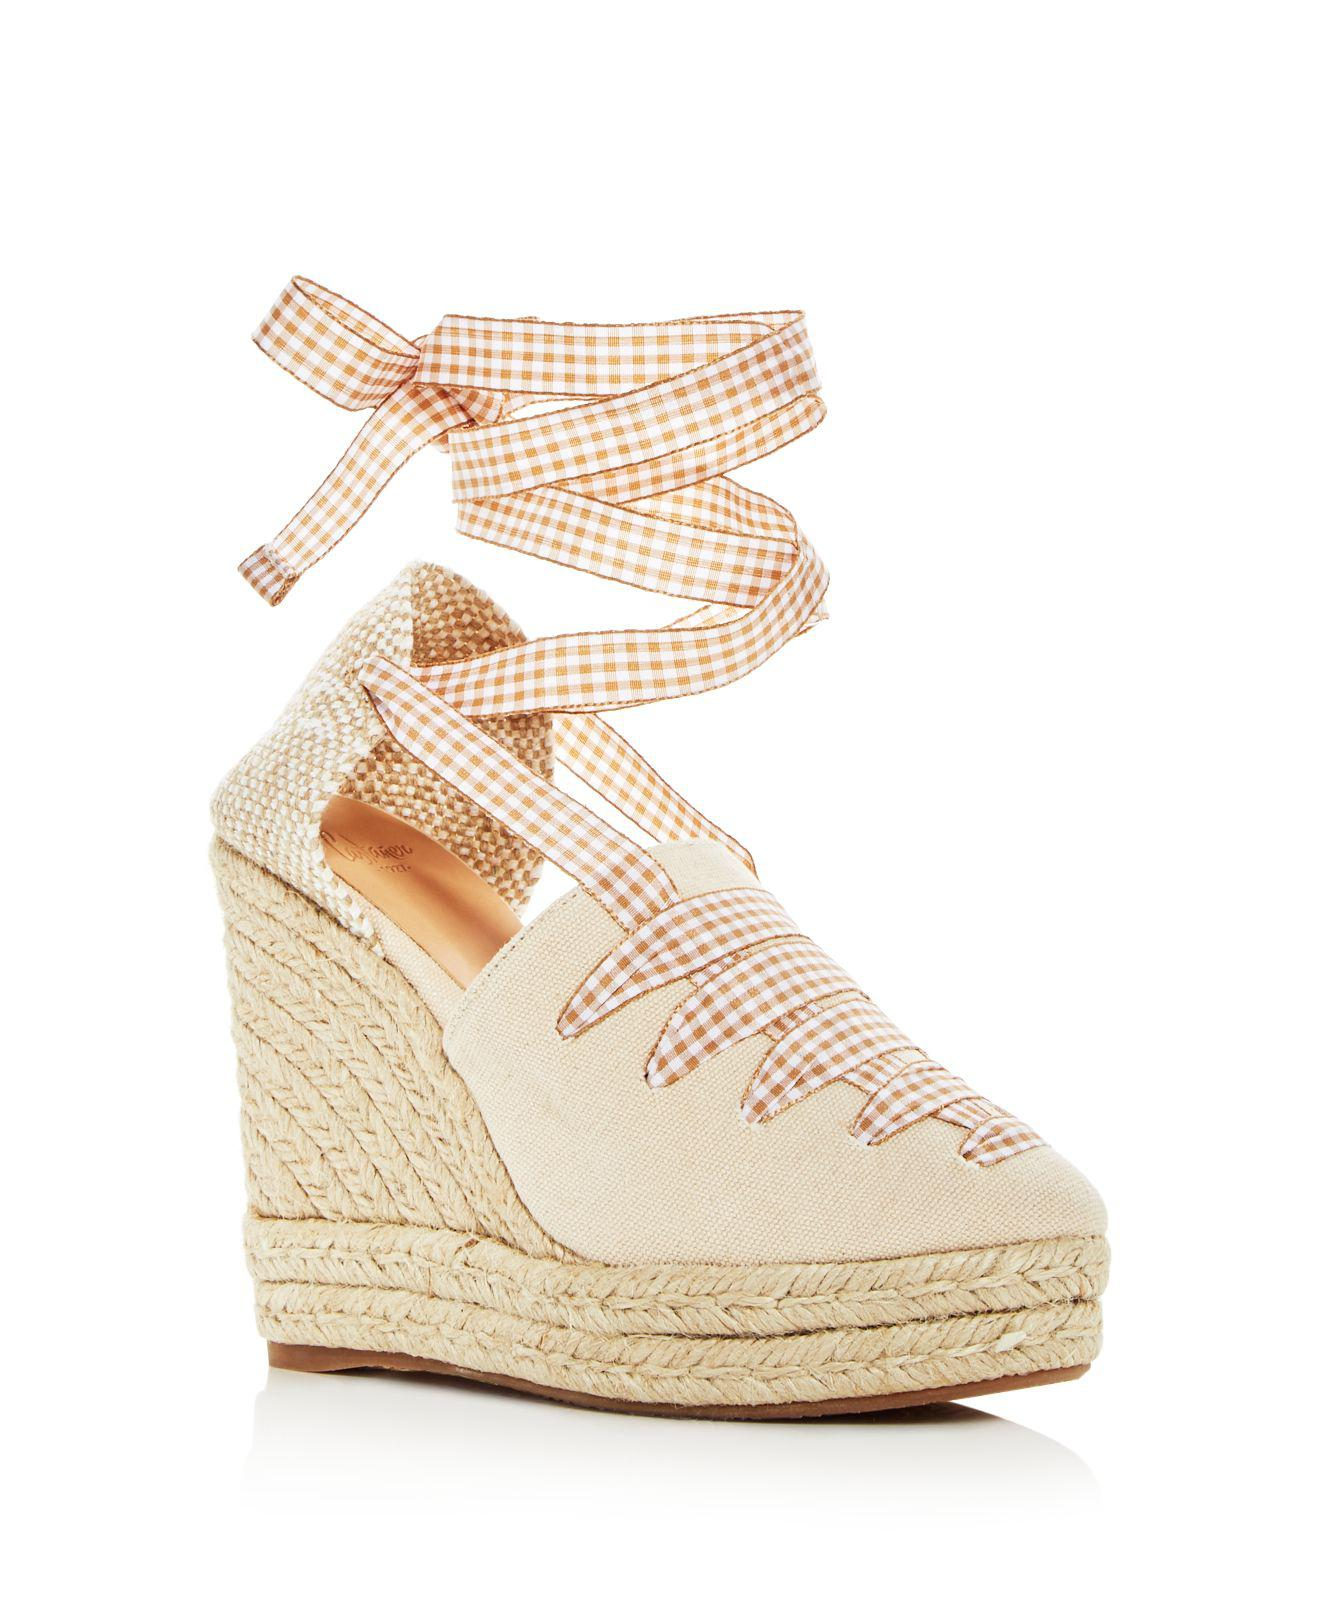 Castaner Women's Lula Ankle Tie Platform Wedge Espadrille Sandals